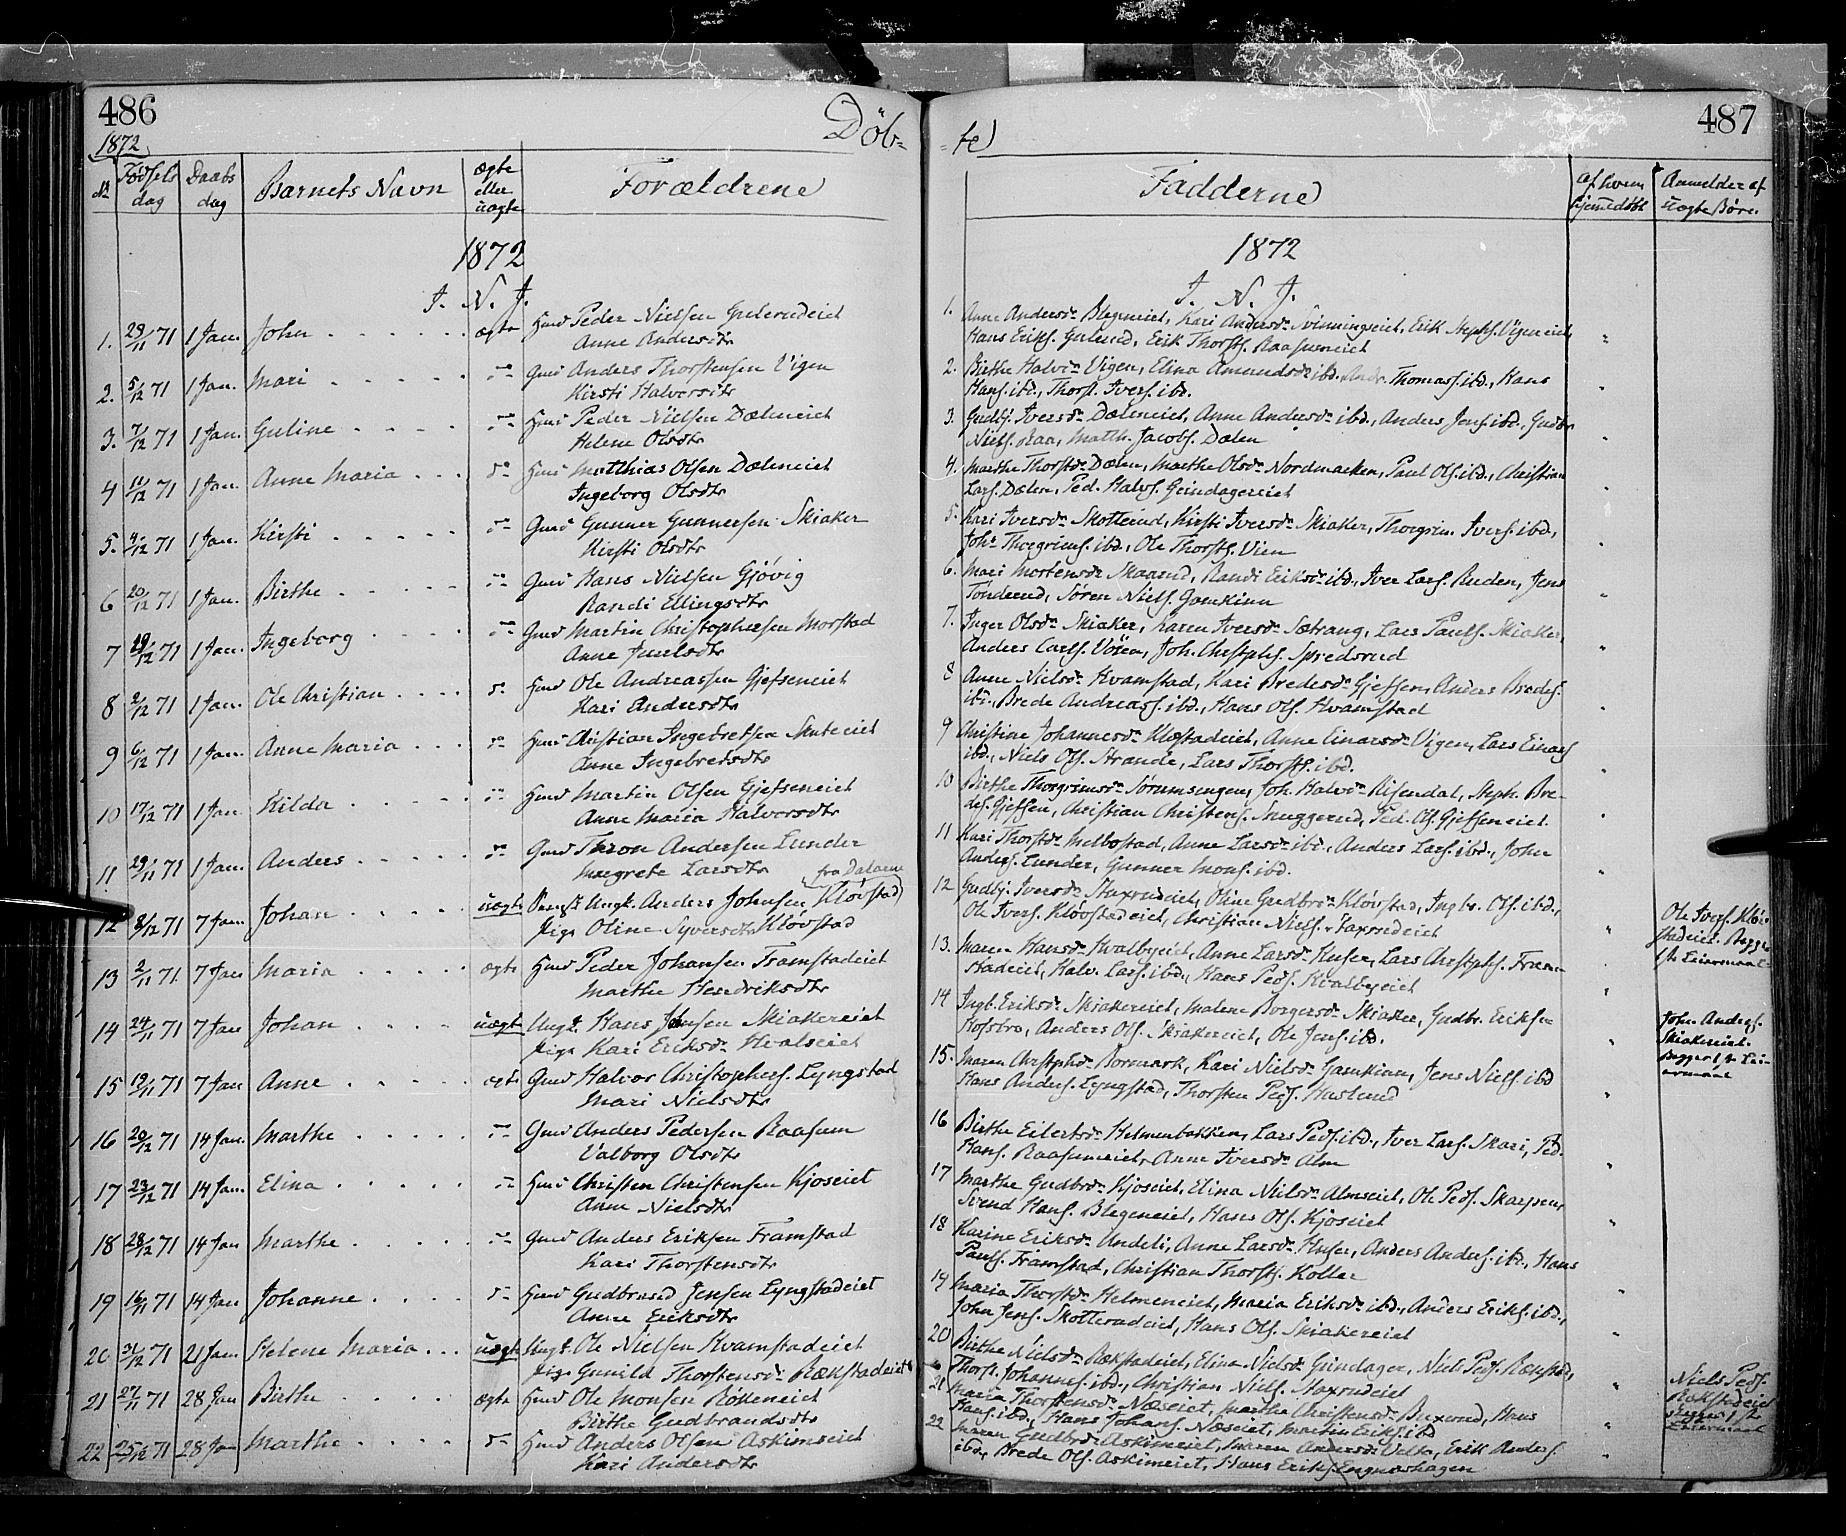 SAH, Gran prestekontor, Ministerialbok nr. 12, 1856-1874, s. 486-487